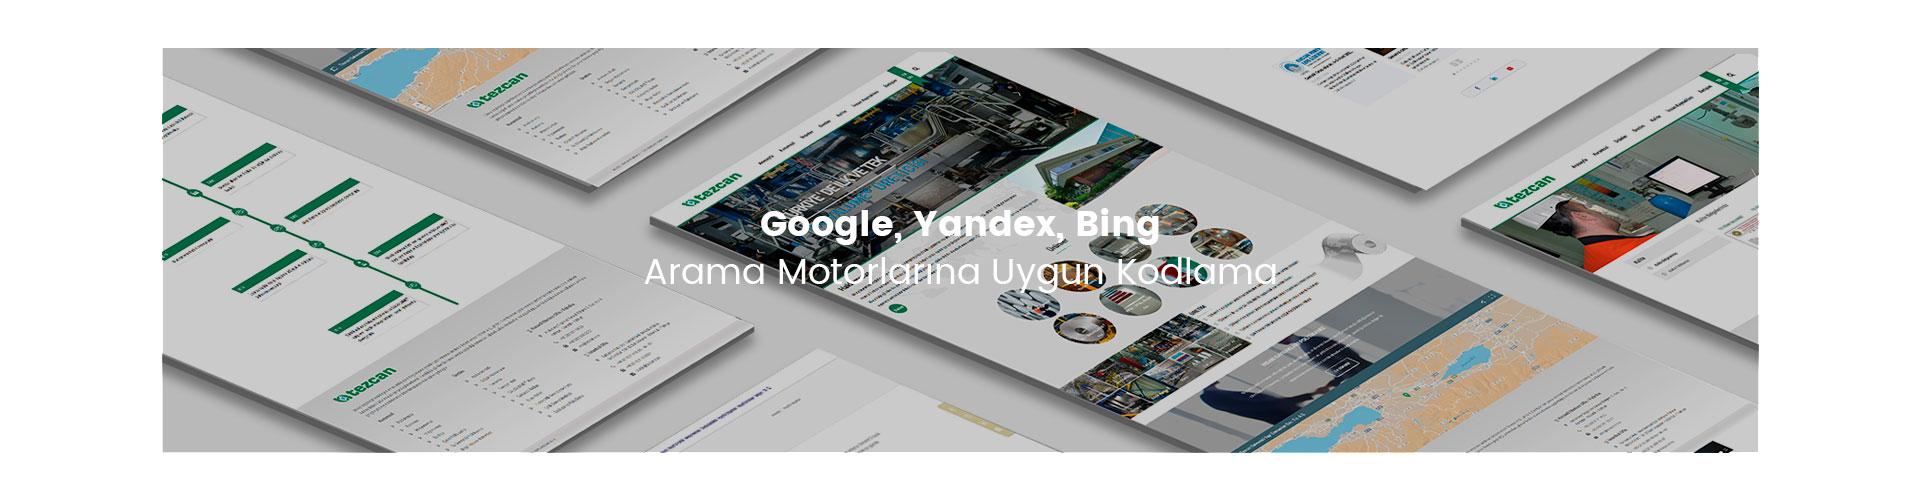 Tezcan-Galvaniz-Google